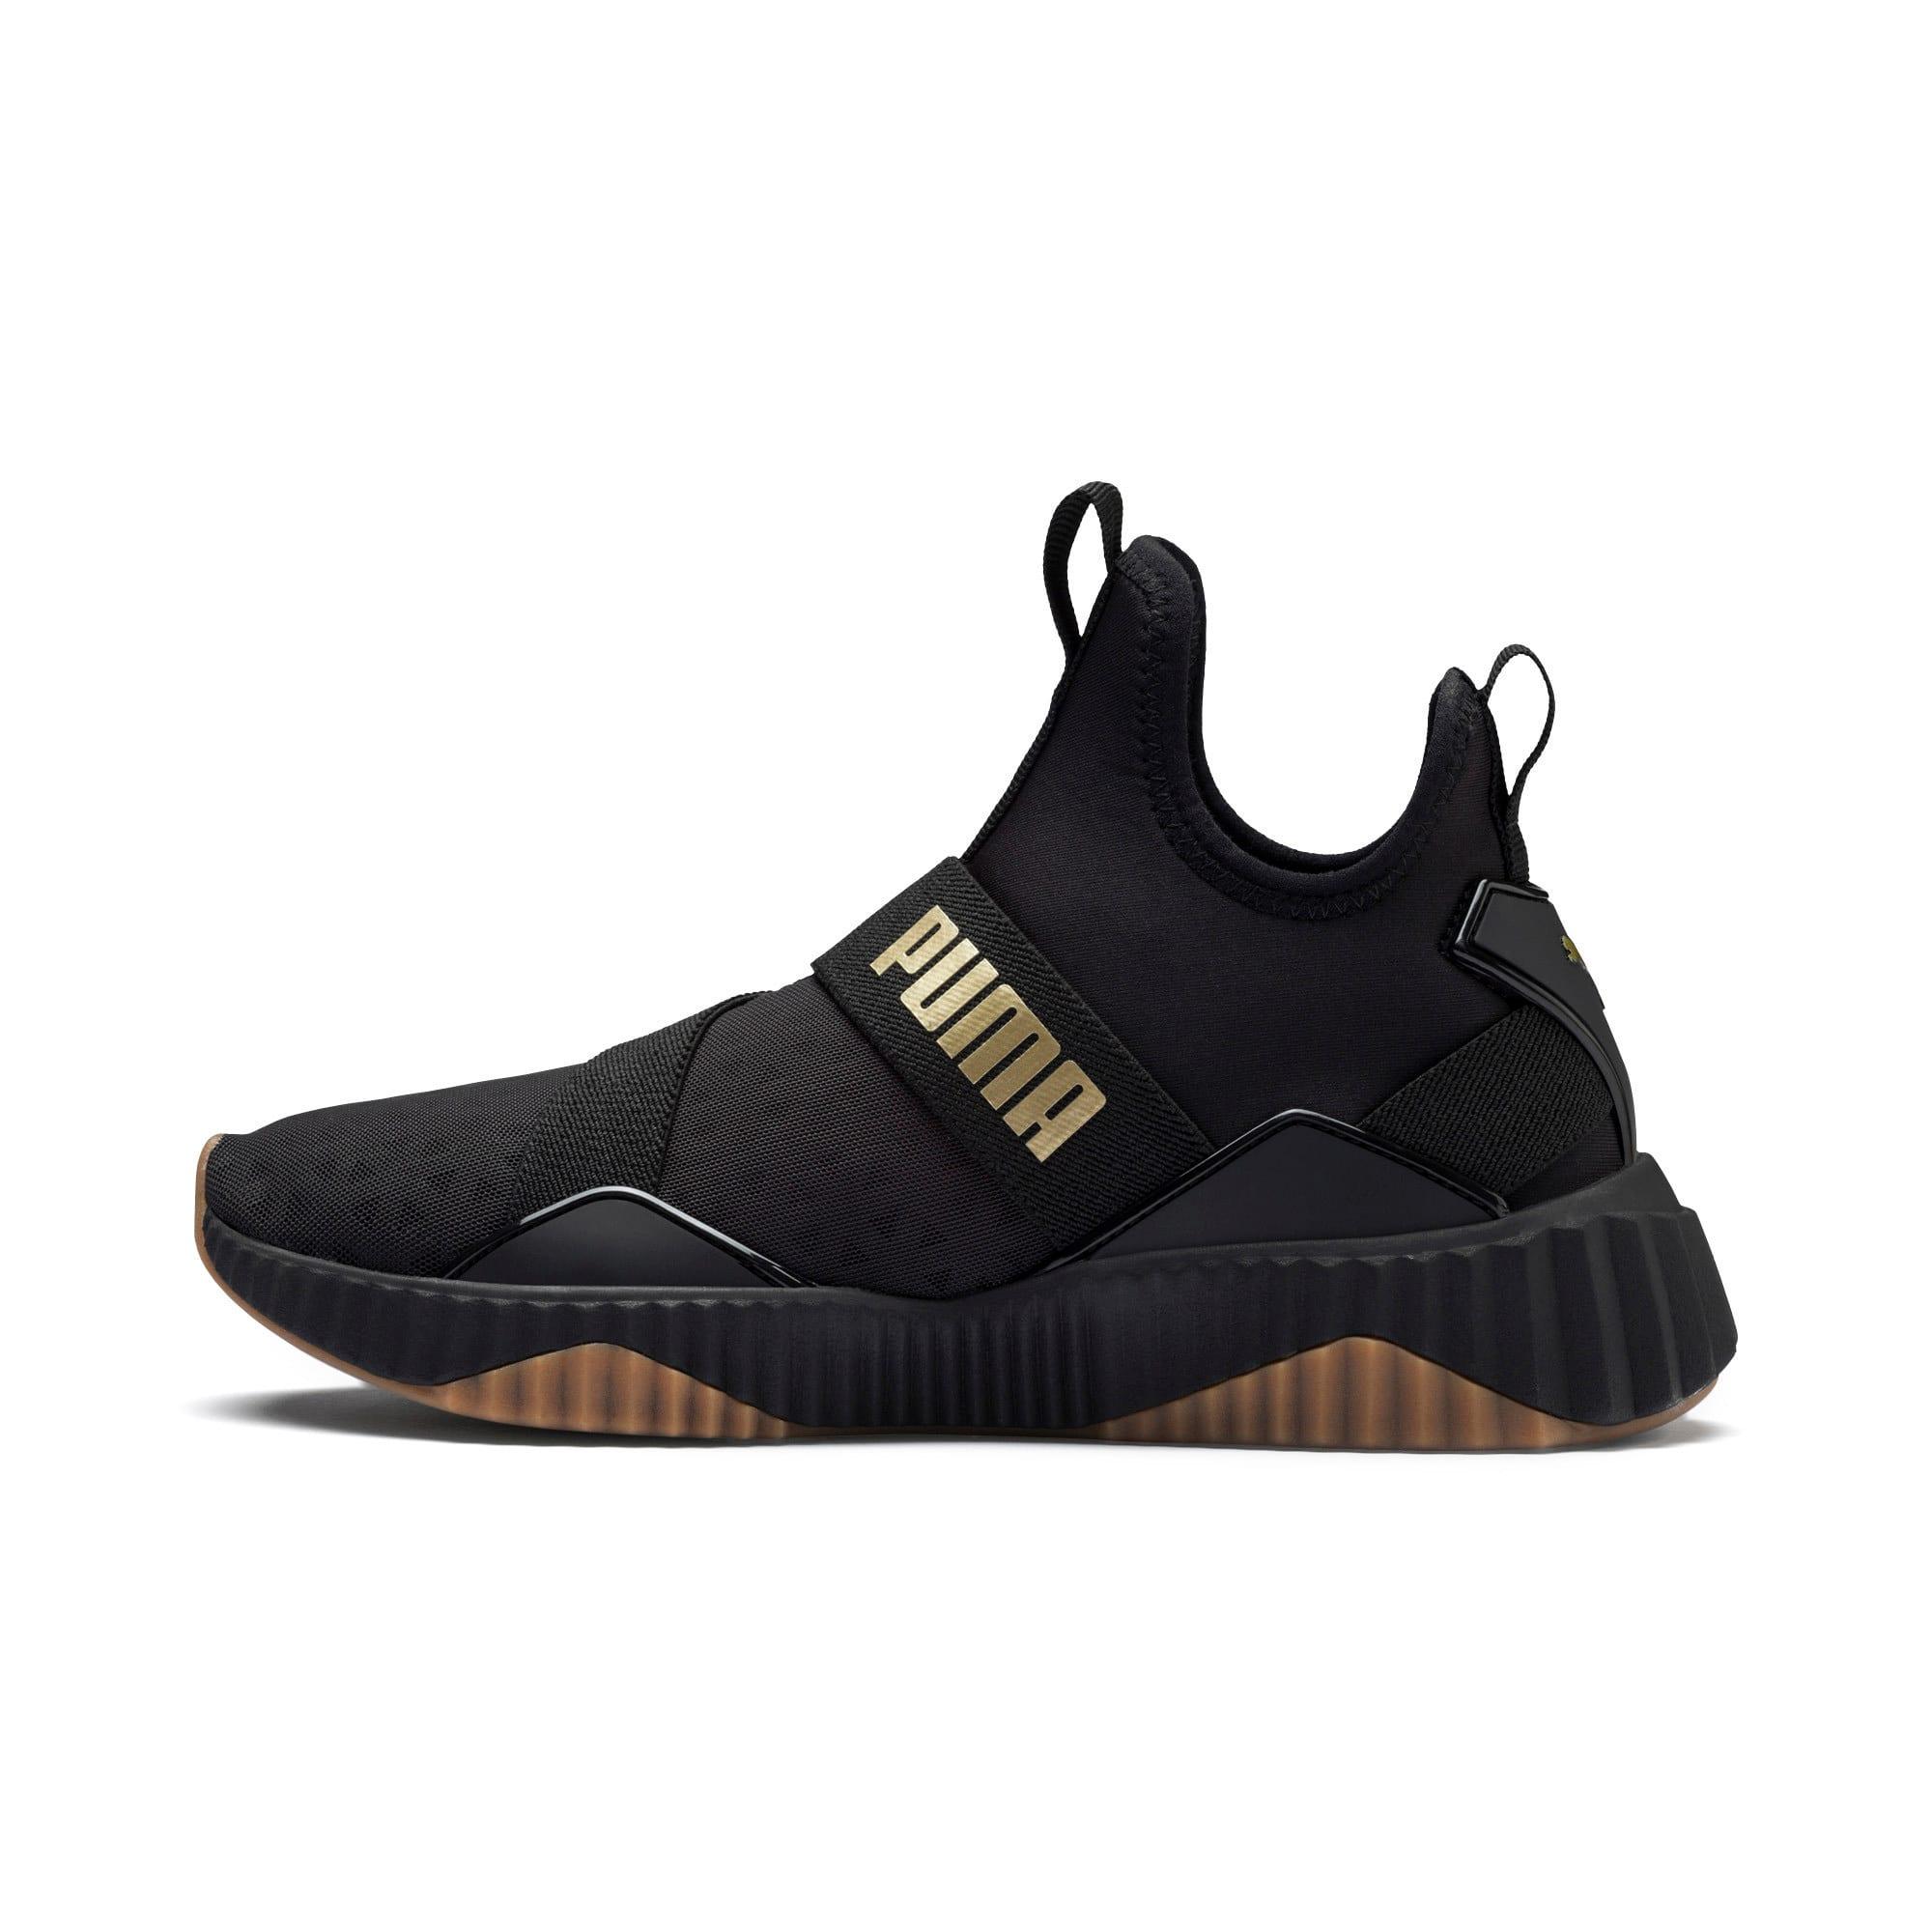 Thumbnail 1 of Defy Mid Sparkle Women's Training Shoes, Puma Black-Metallic Gold, medium